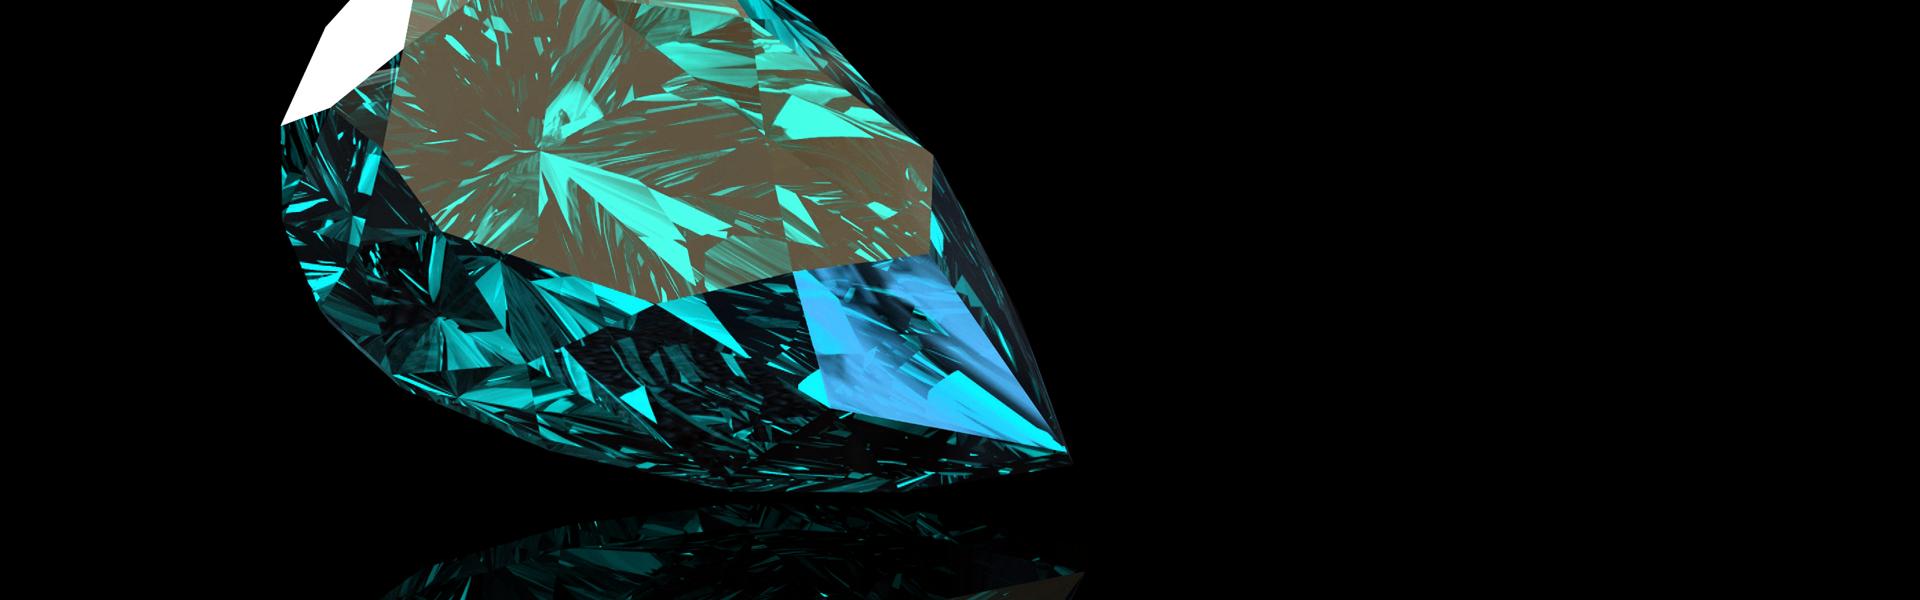 Shangem Slide - 0